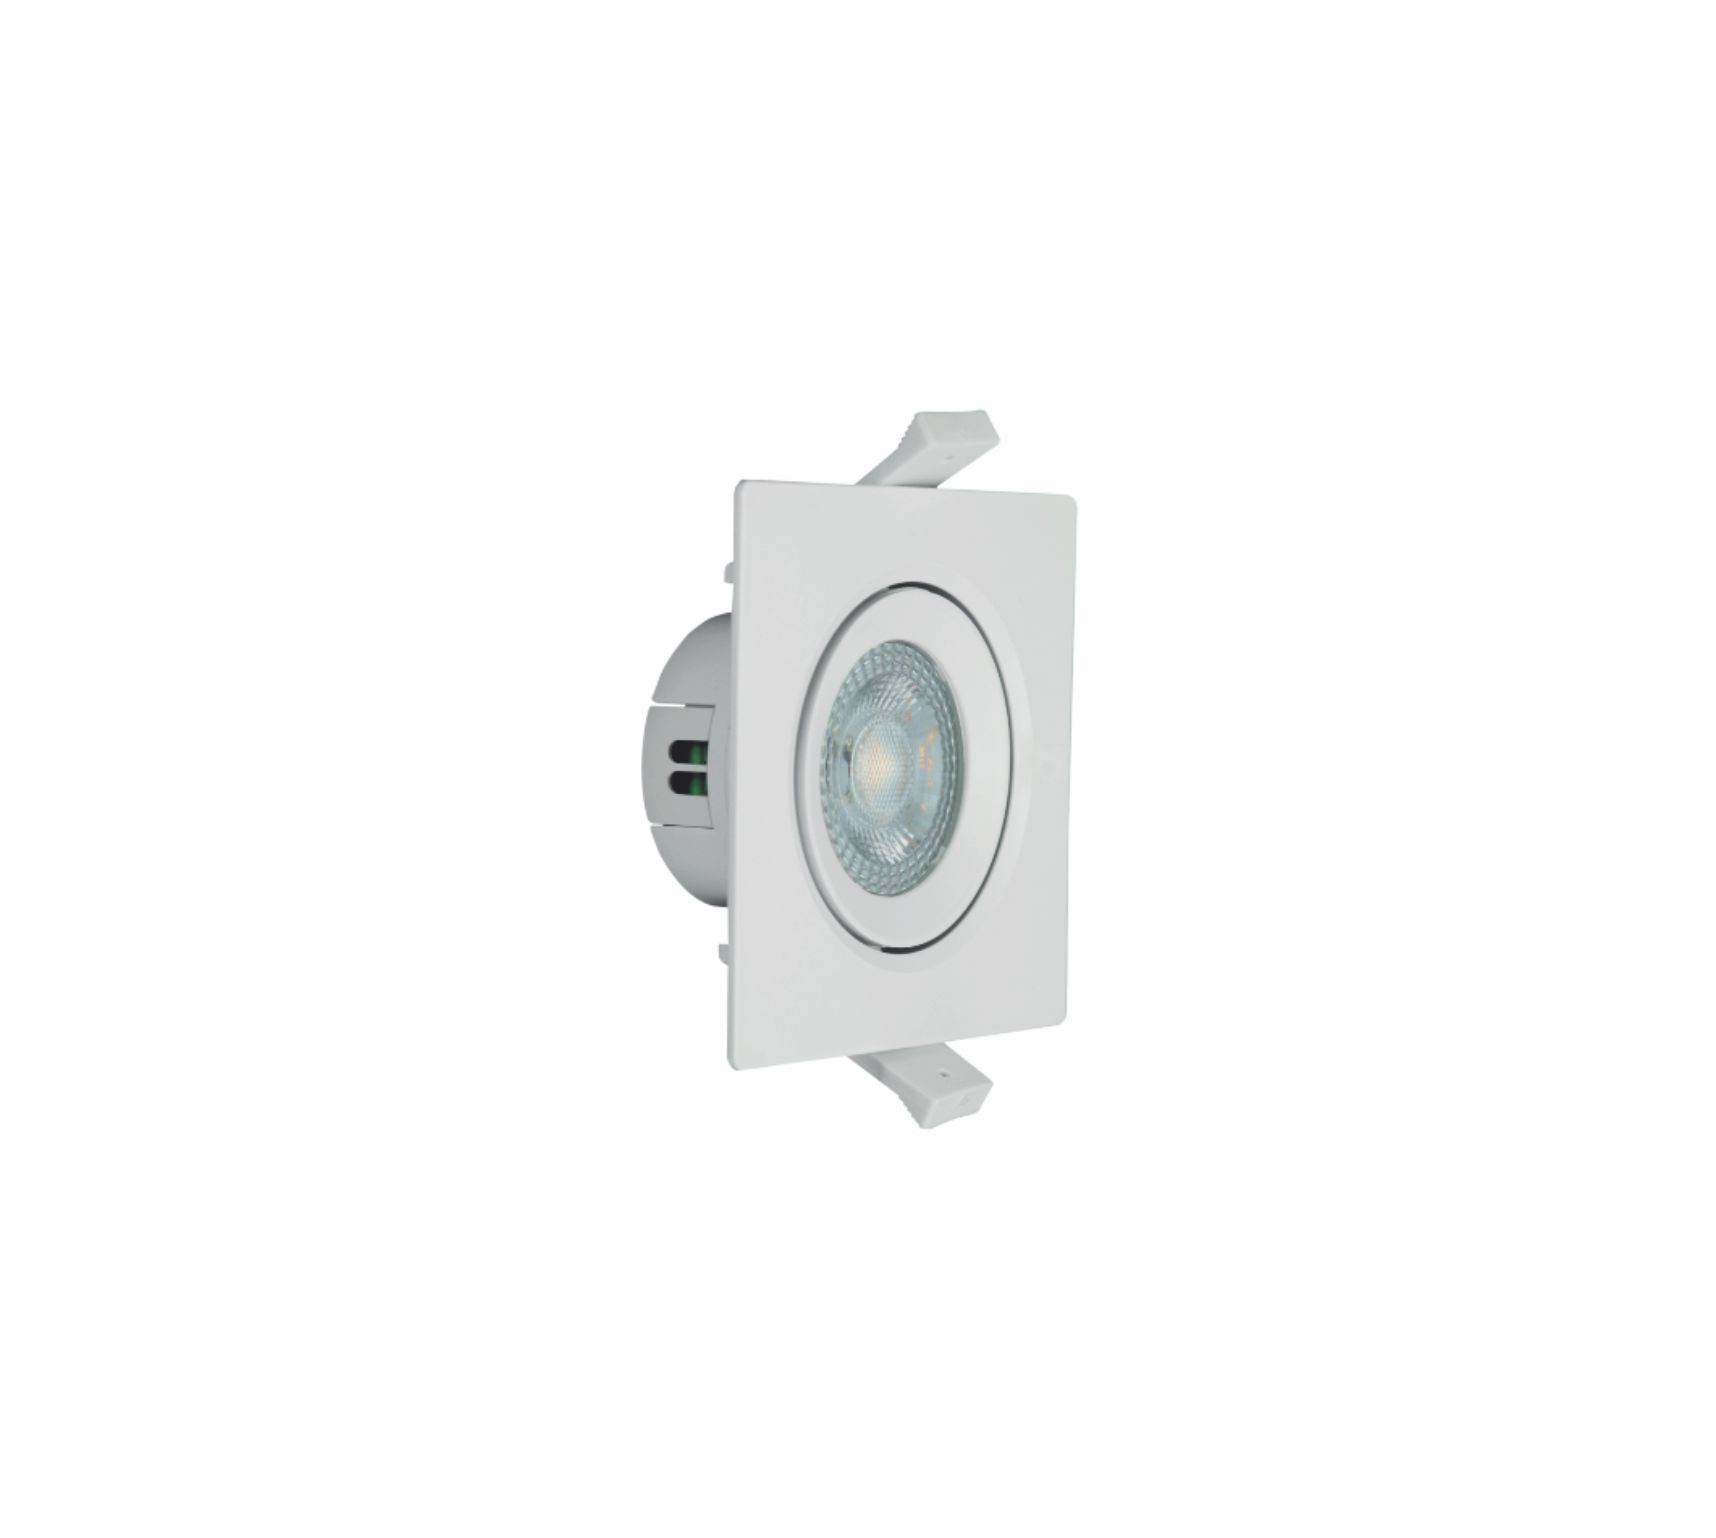 Spot LED Quadrado 4W 6500K Branco AUTOVOLT